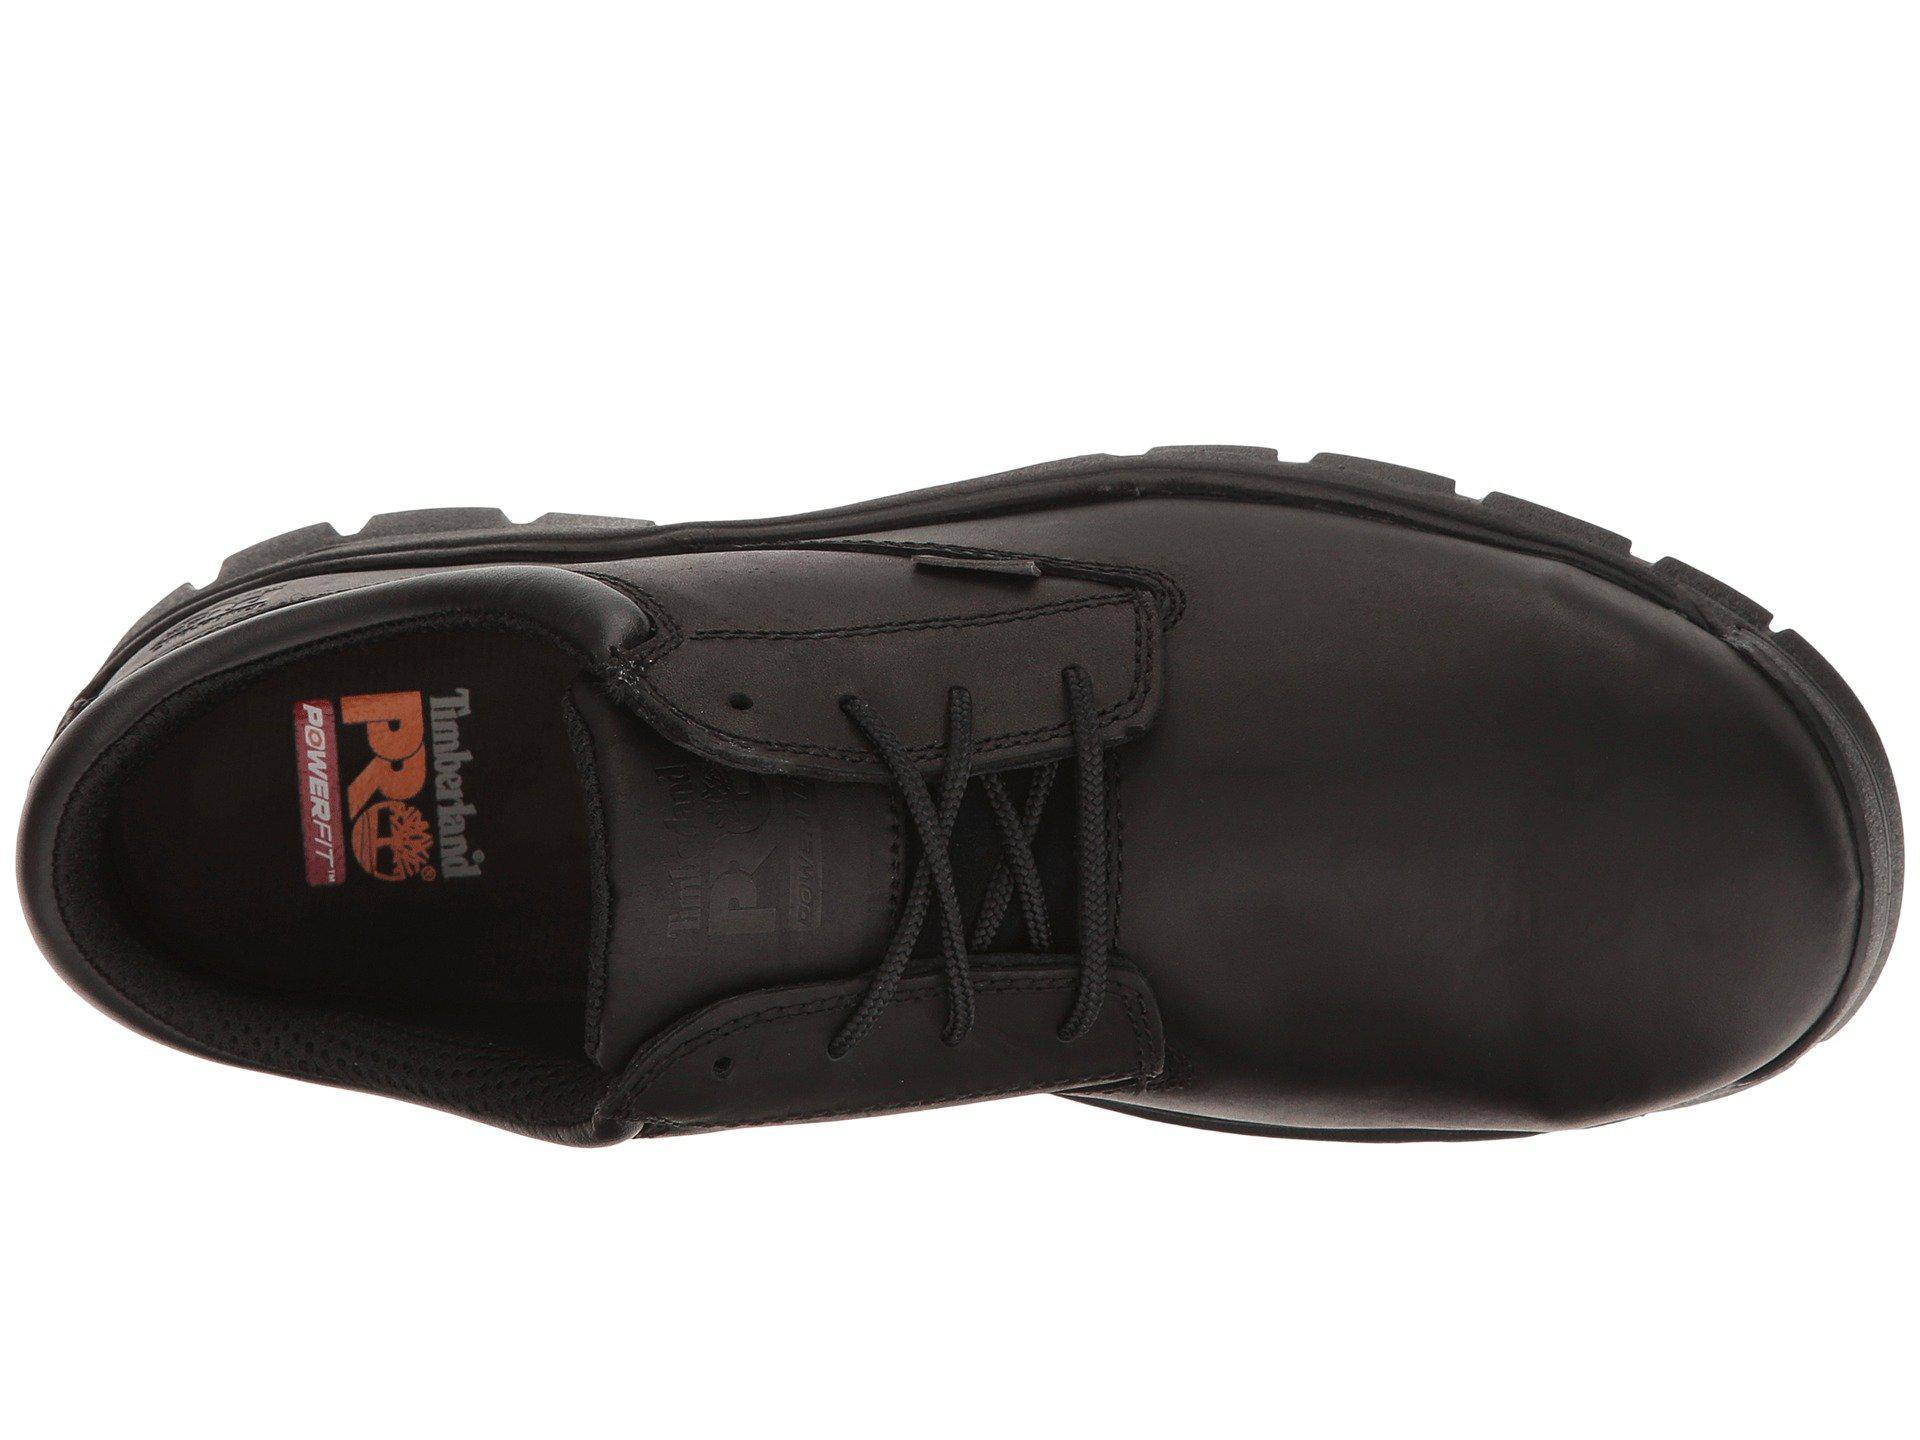 Lyst - Timberland Stockdale Alloy Safety Toe Waterproof Boot (black ... 1e246b40e